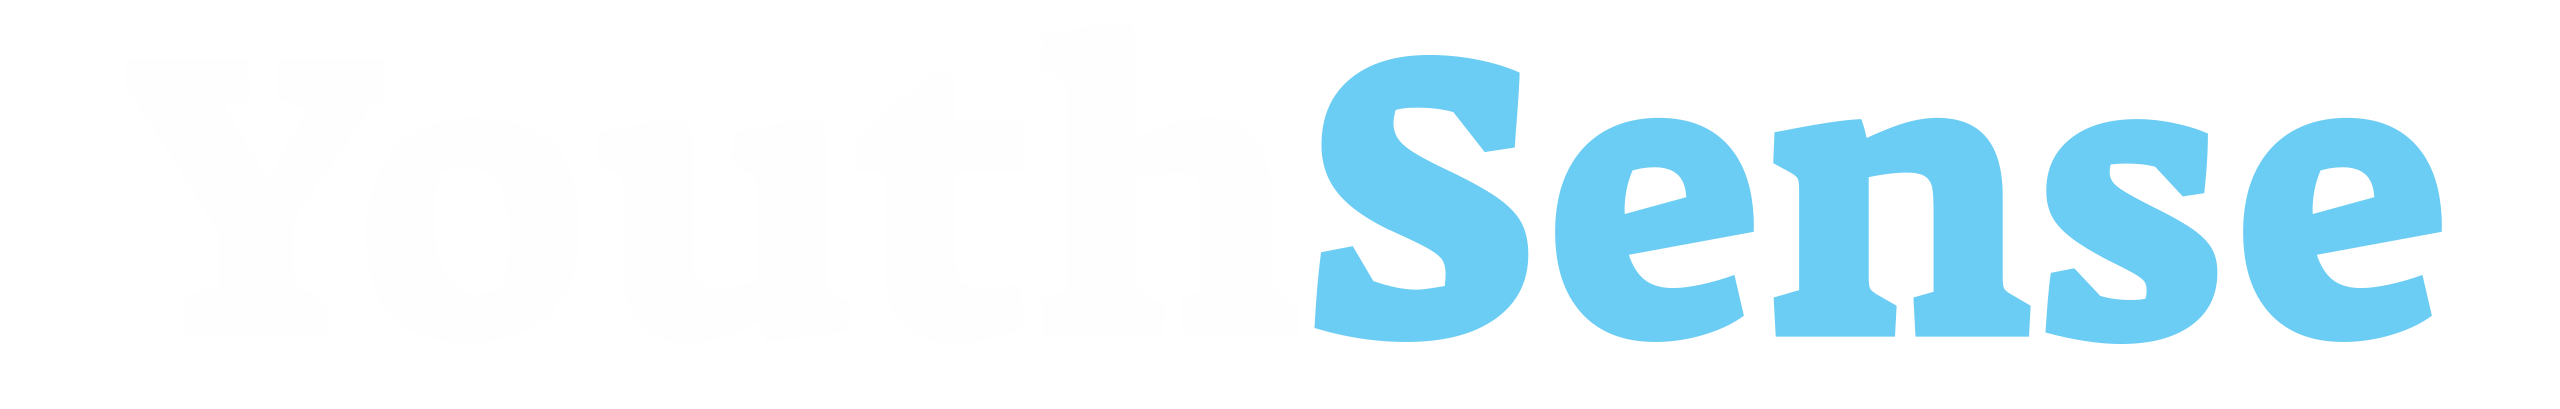 YouthSense